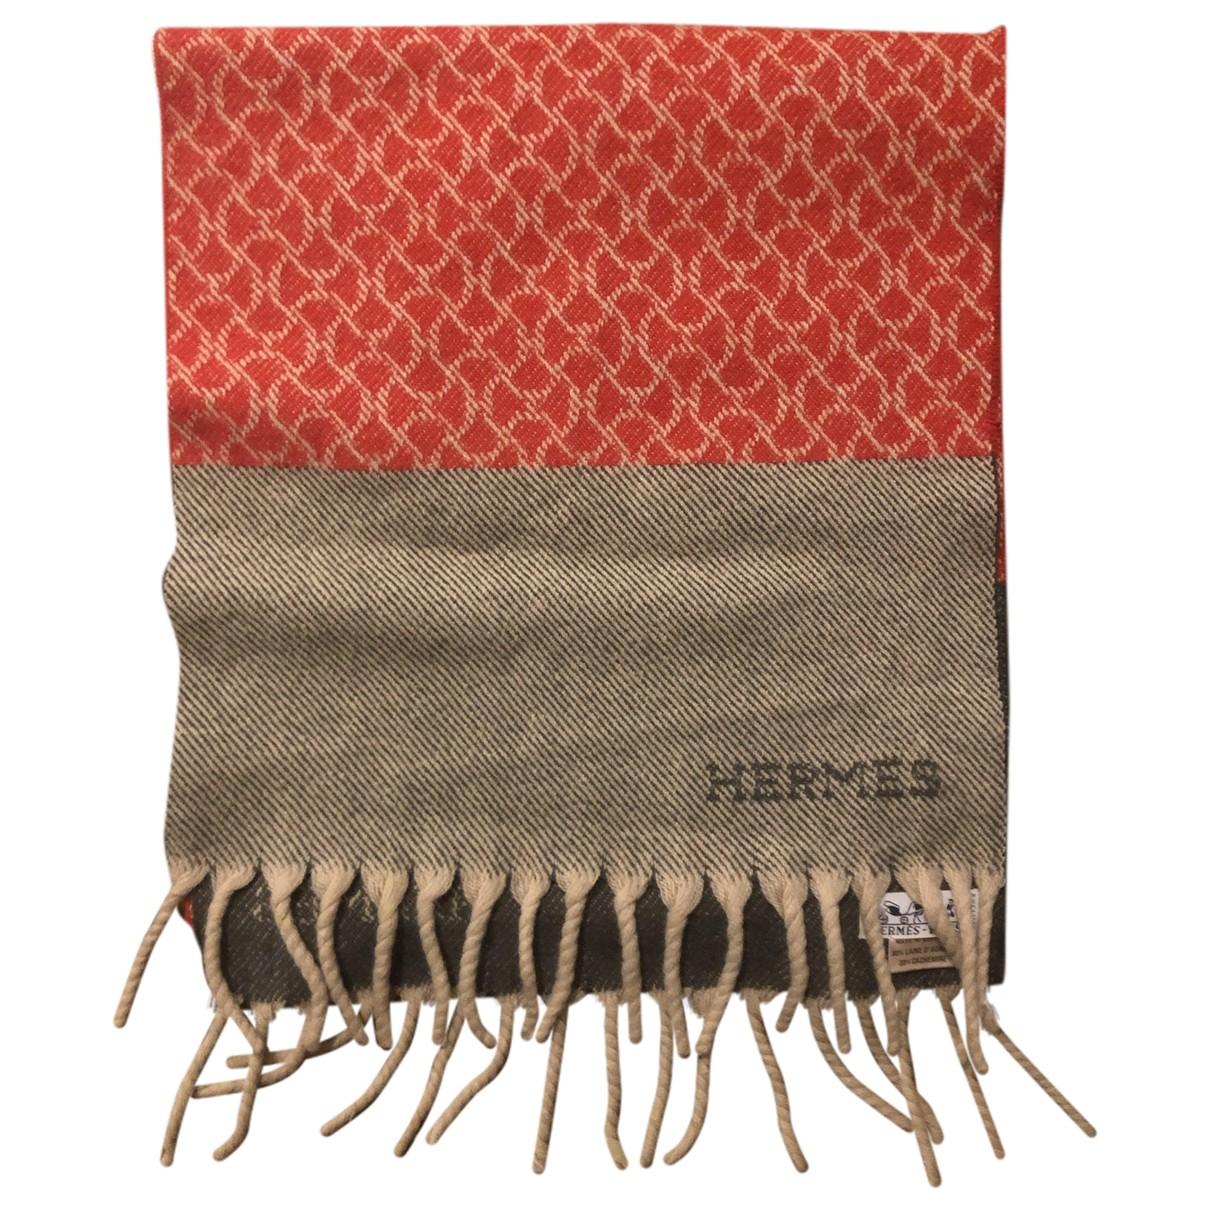 Pañuelo / bufanda de Lana Hermes